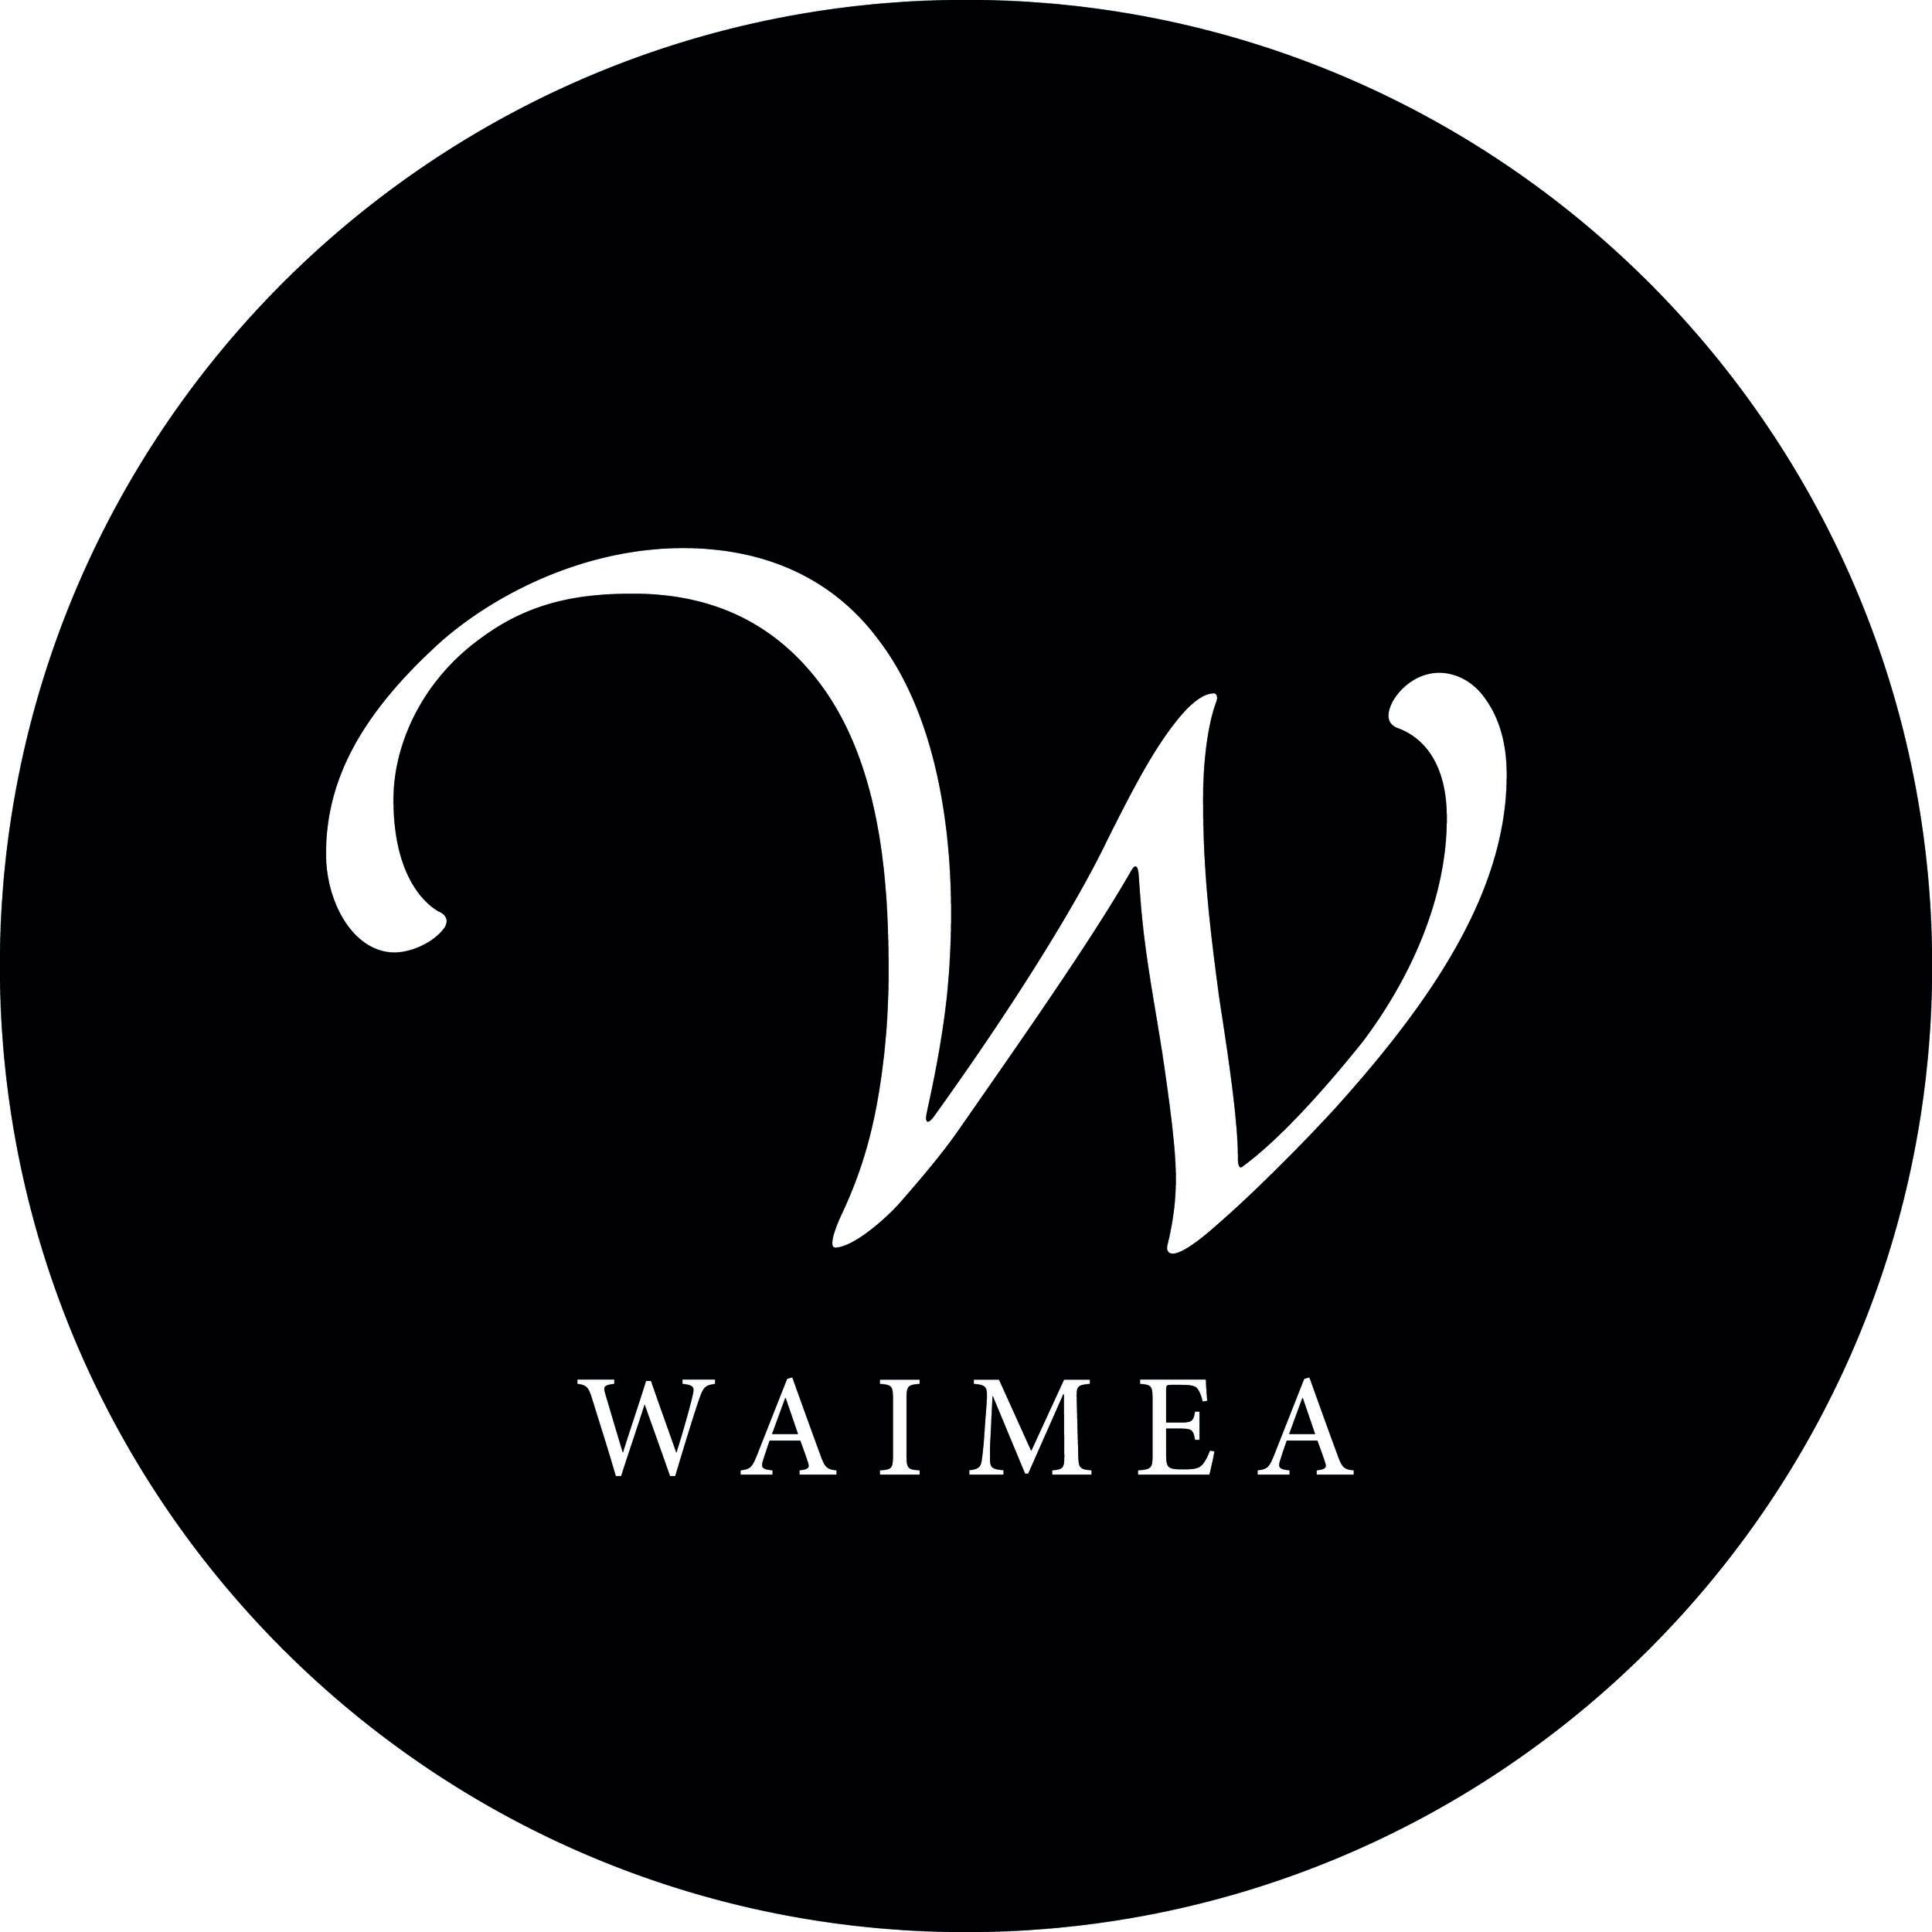 WAI_Logo_White_Circle_800x800px.jpg